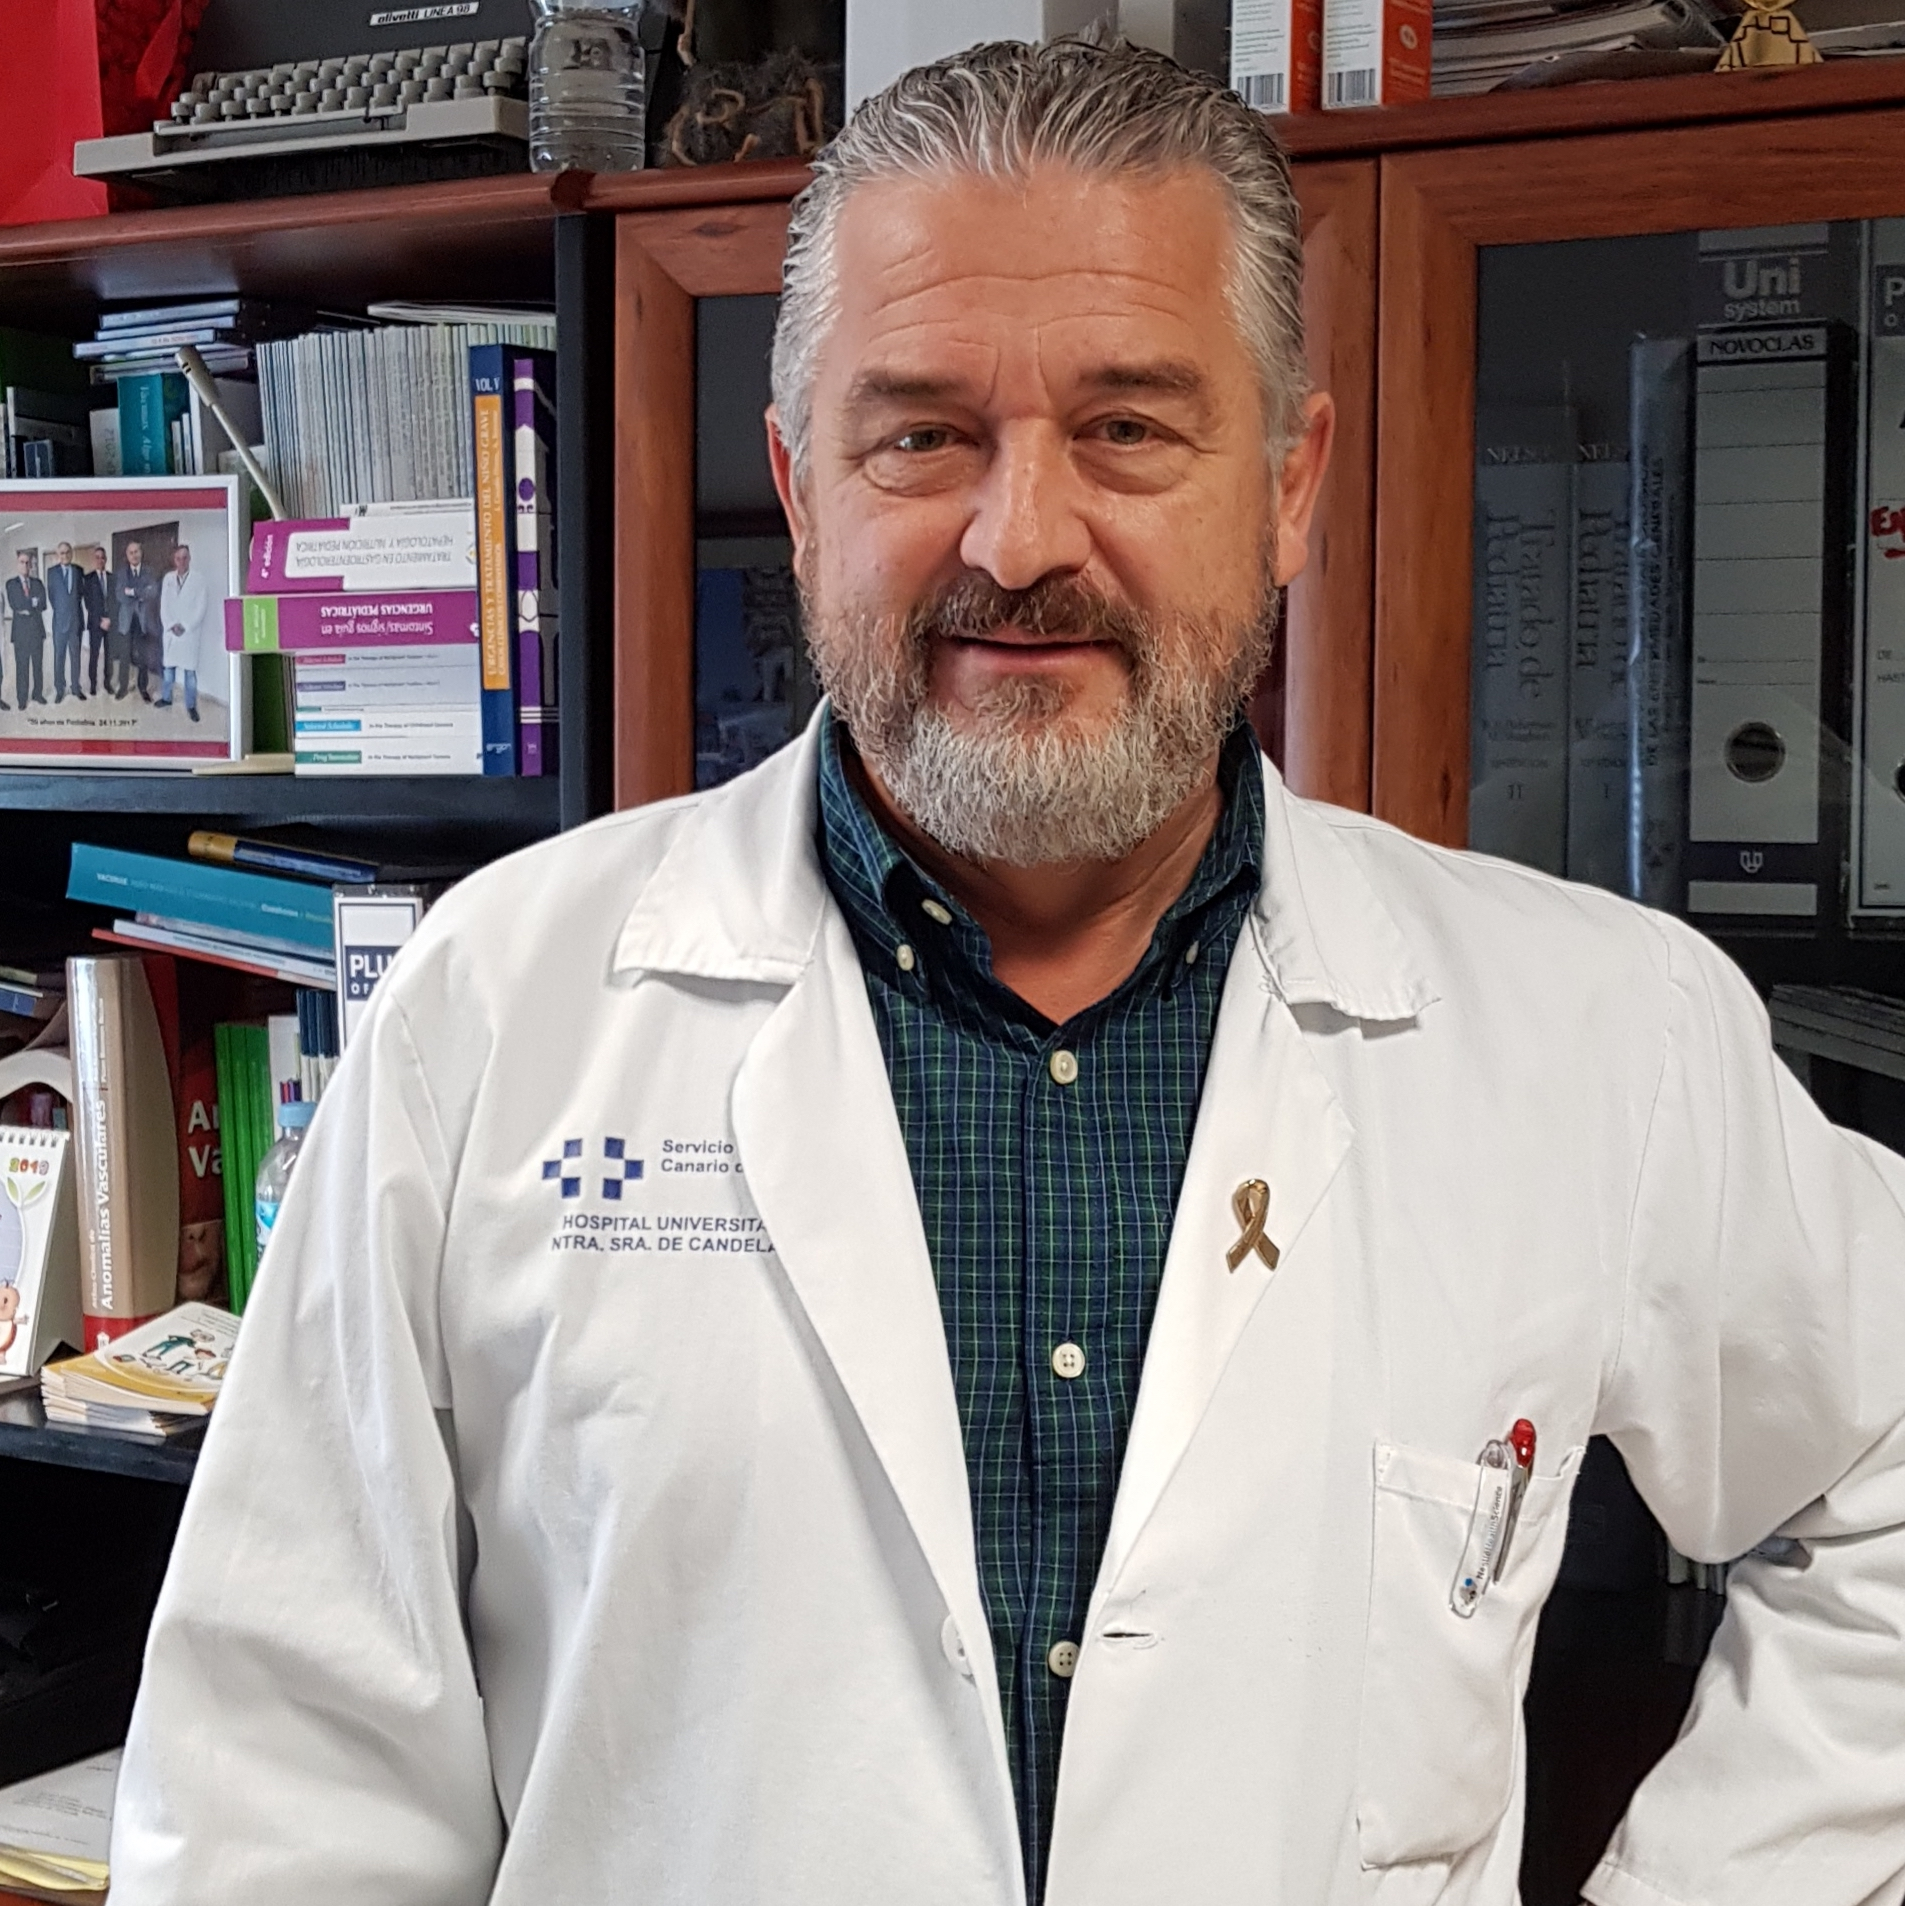 Dr. Jorge Gómez Sirvent